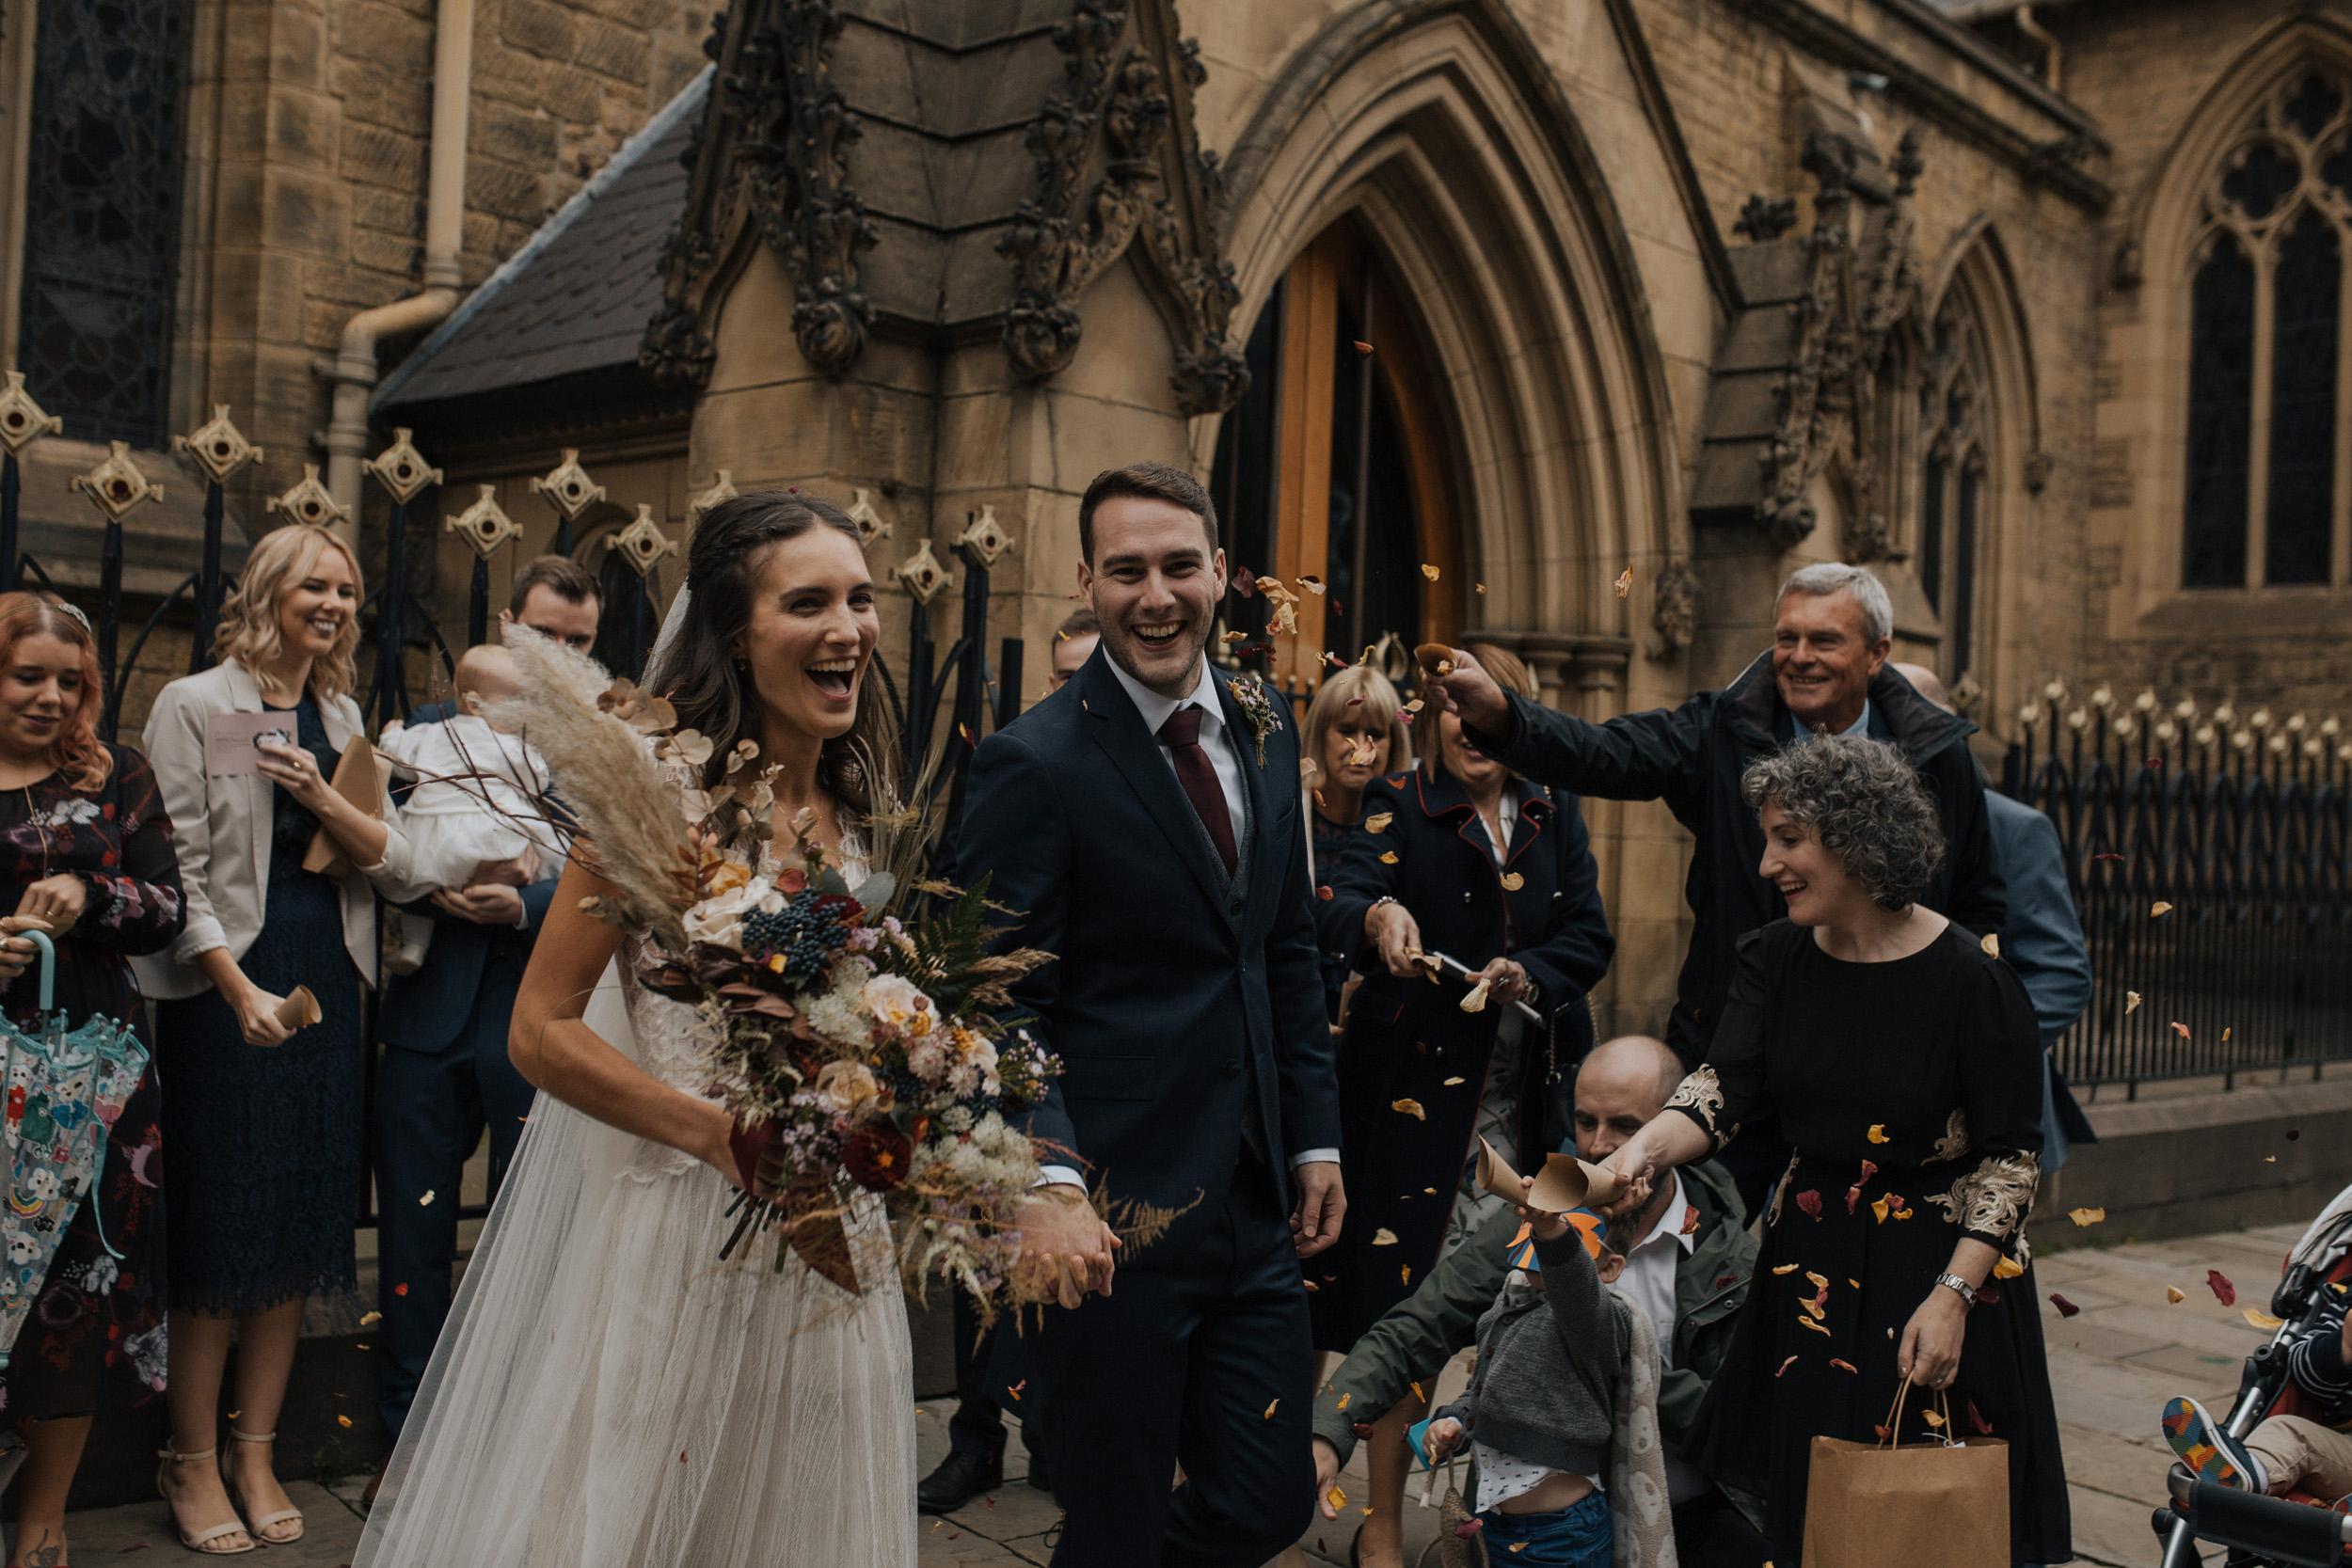 Joasia-Kate-Beaumont-Bohemian-Lace-Wedding-Dress-Peak-District-Sheffield-Wedding-17.jpg